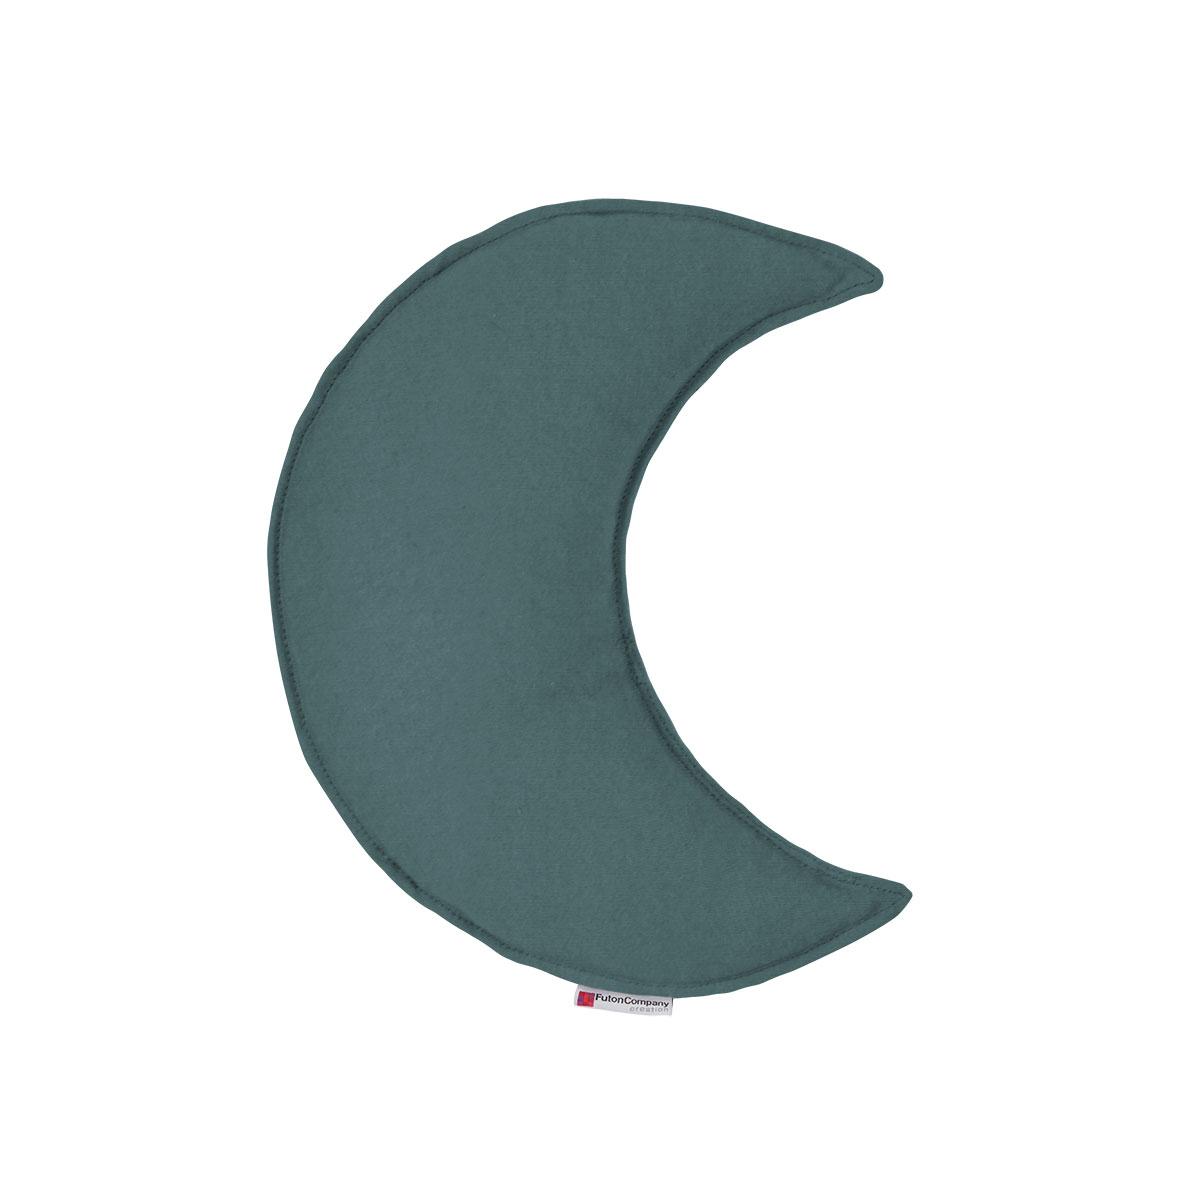 Almofada Lua Sharp M Sarja Flanelle Azul sereno